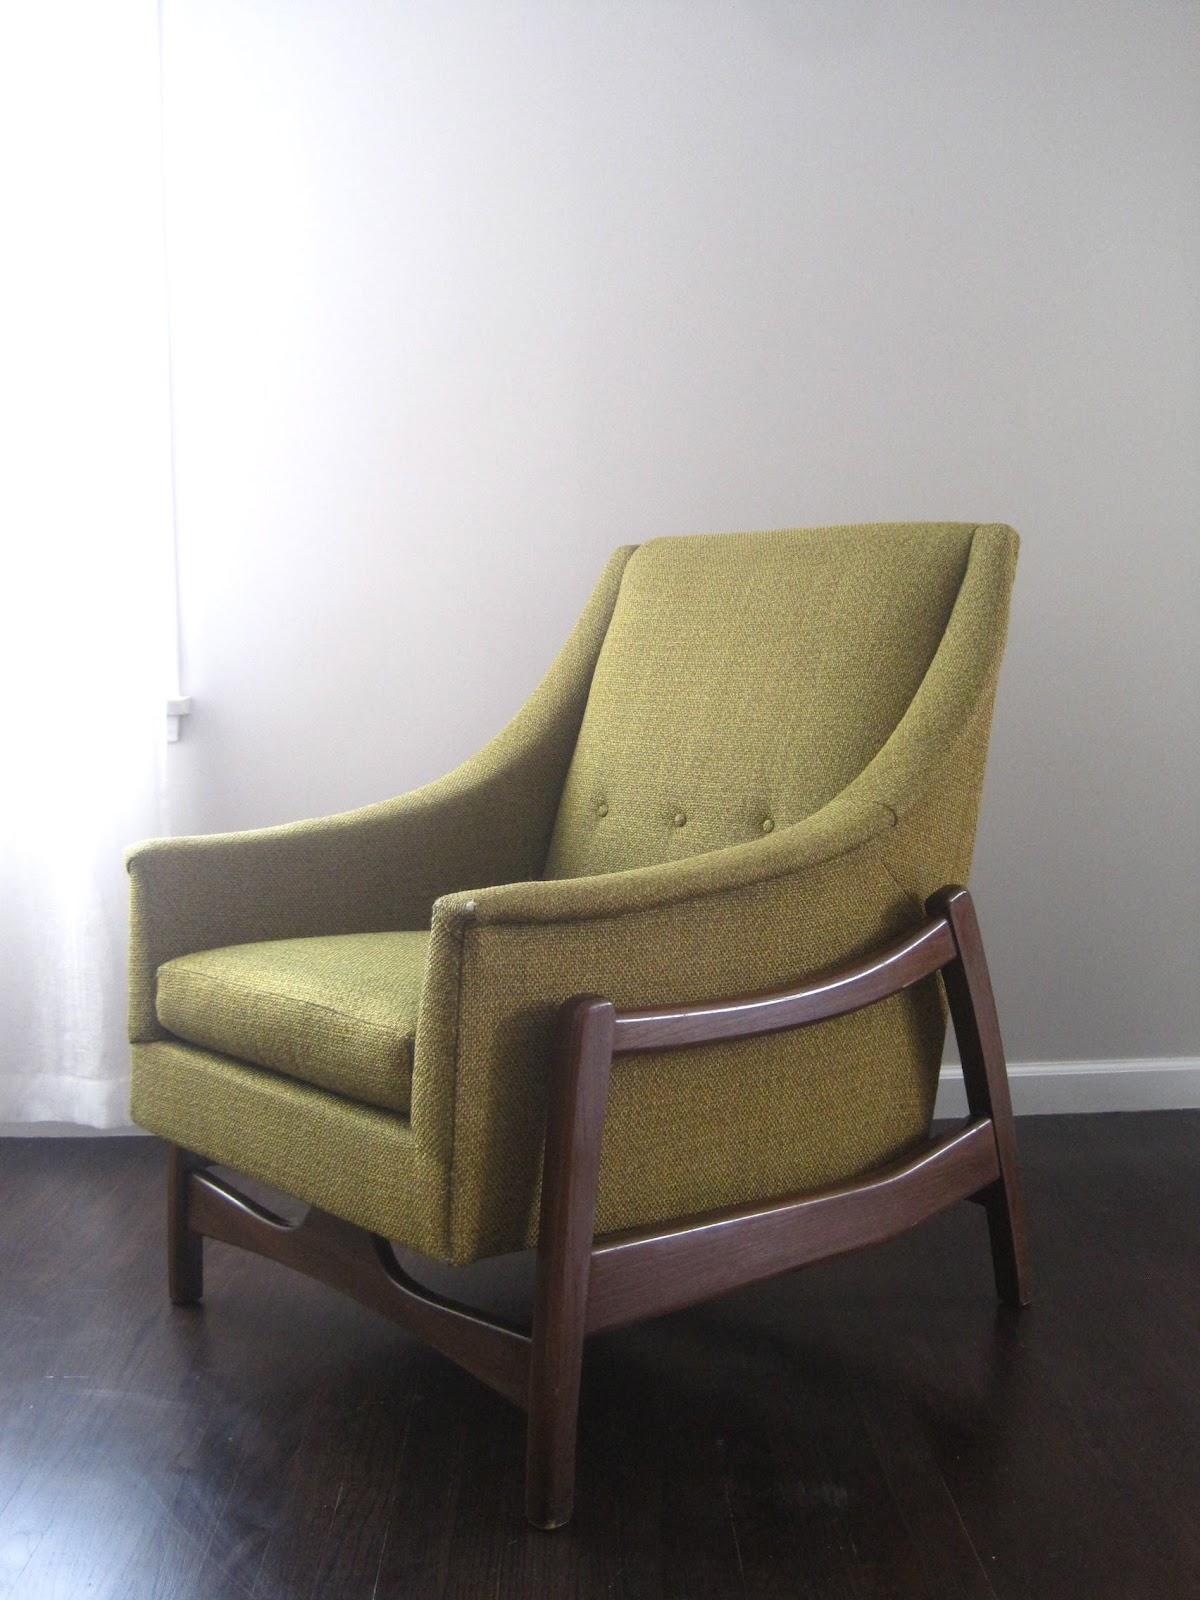 Mid Century Rocker Chair Kneeling For Back Pain Rhan Vintage Modern Blog Paoli